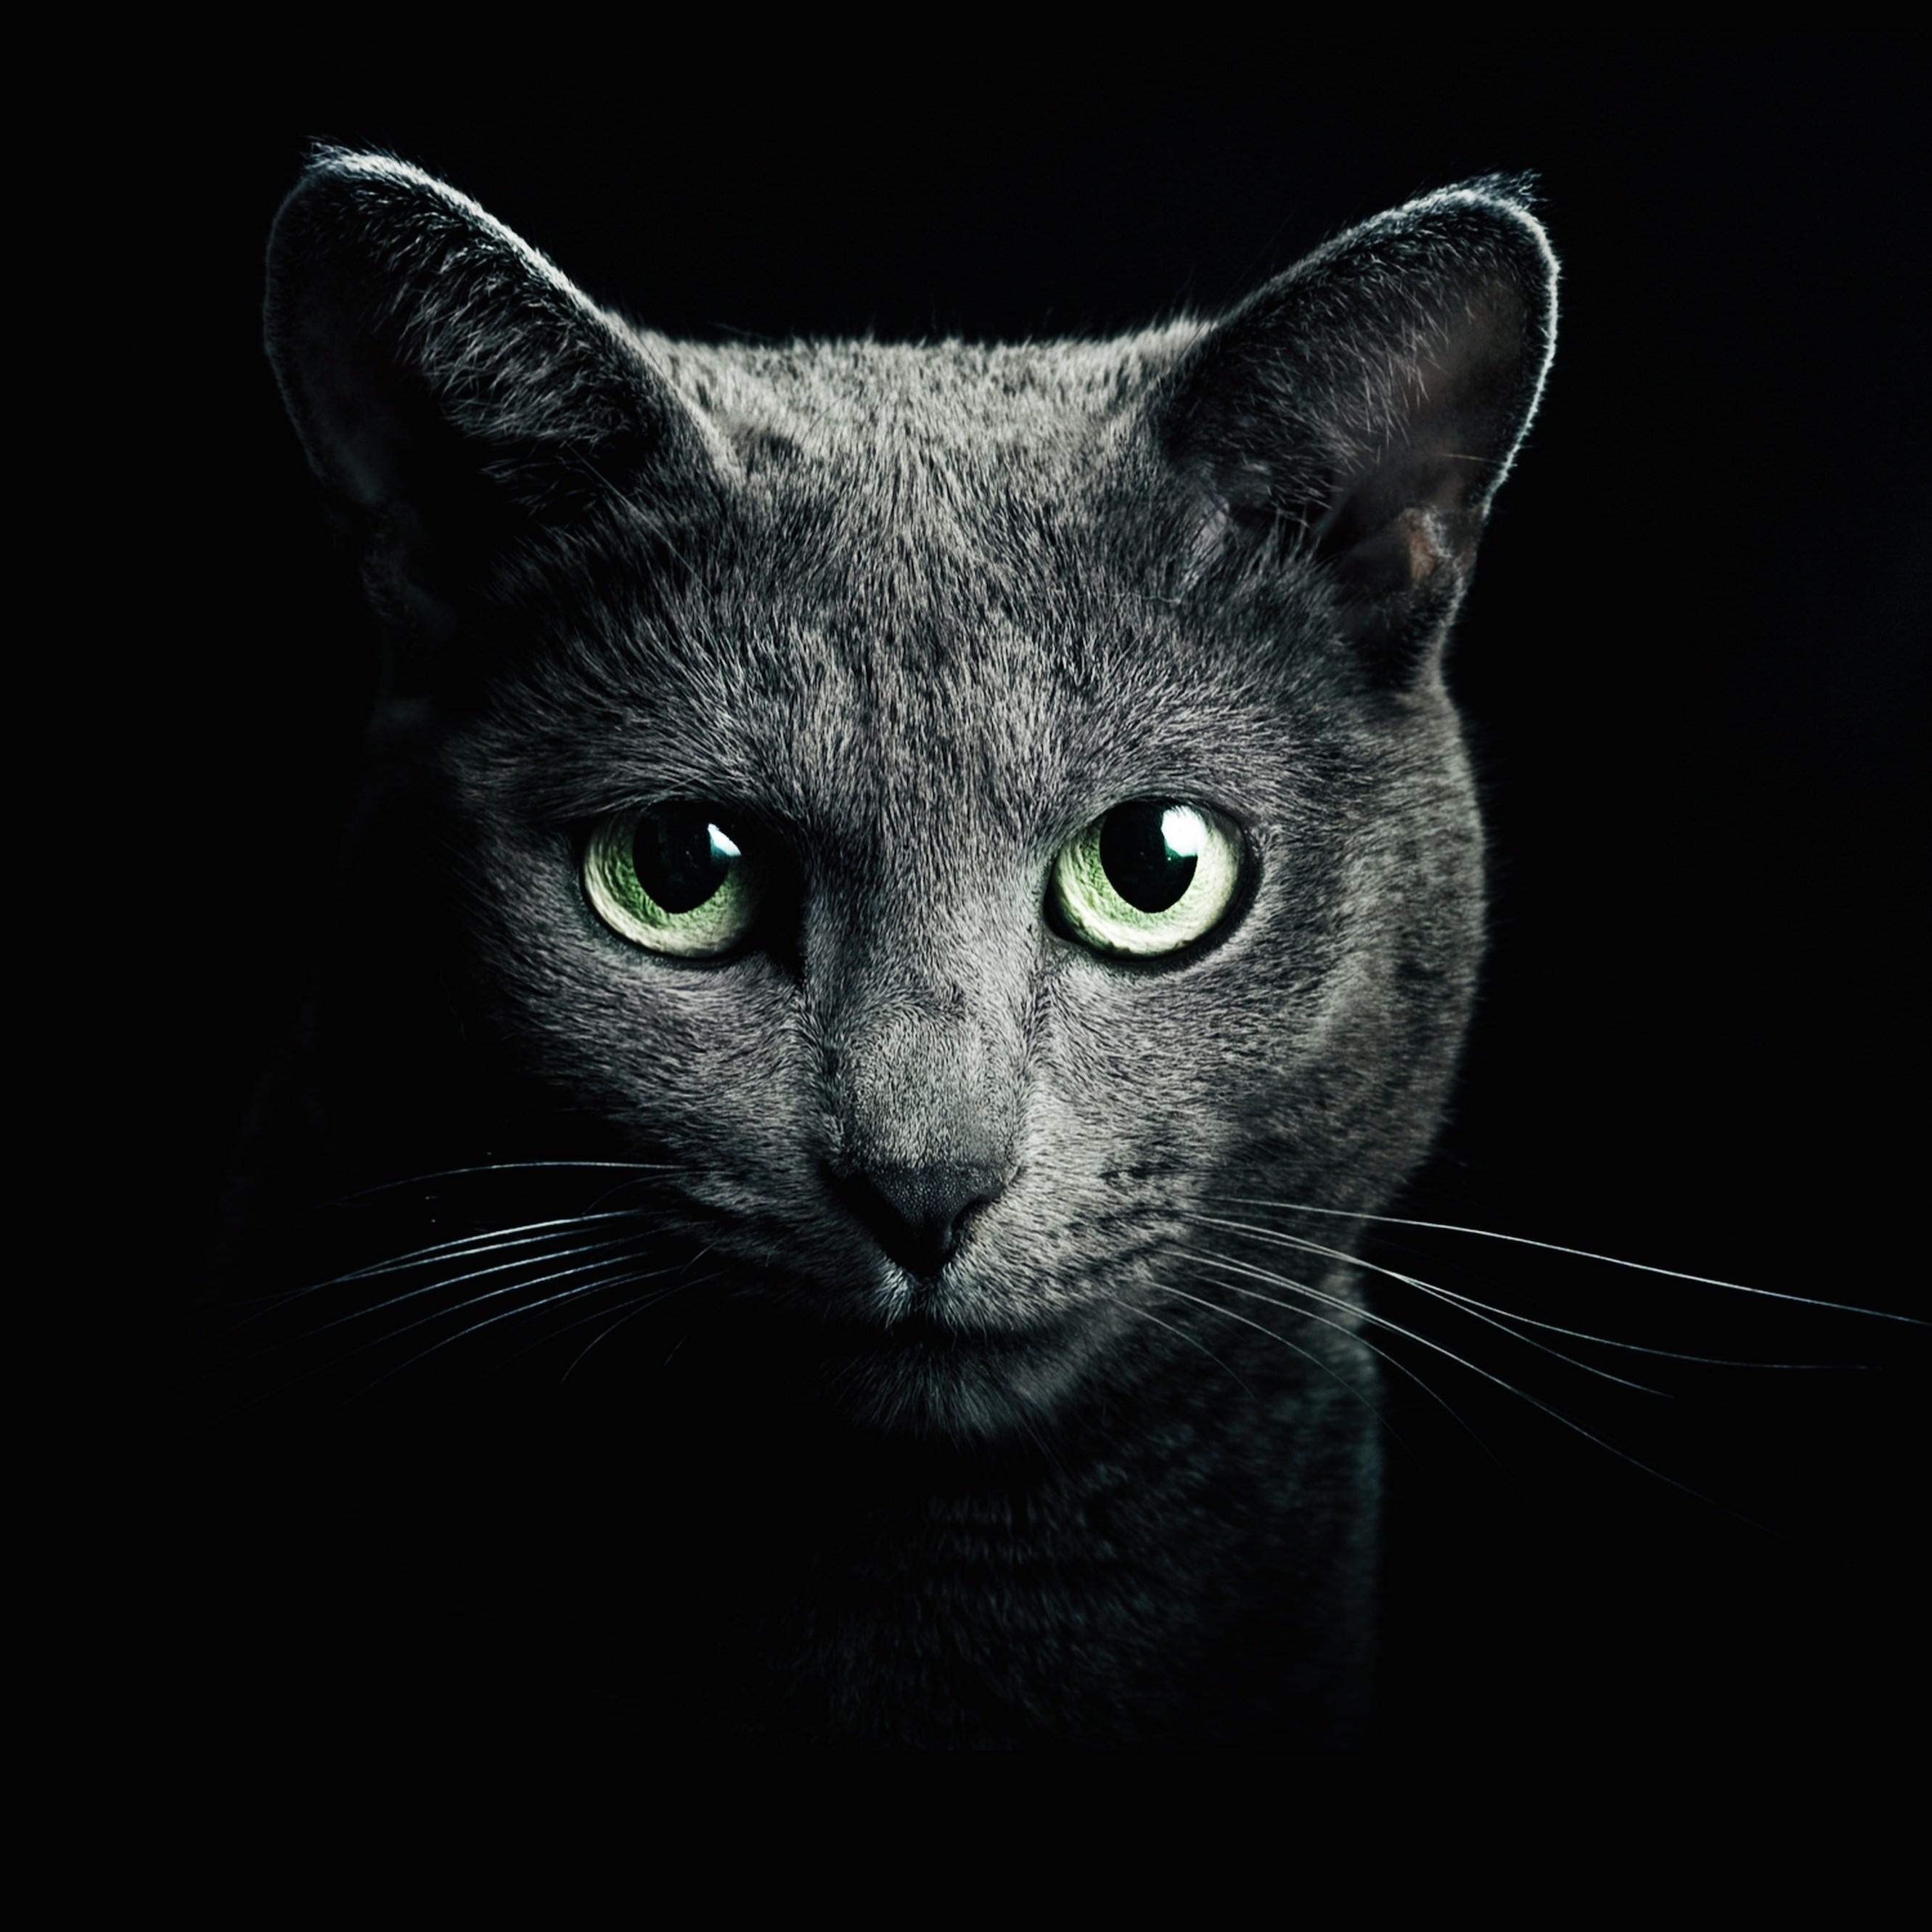 Warrior Cats Wallpaper Download